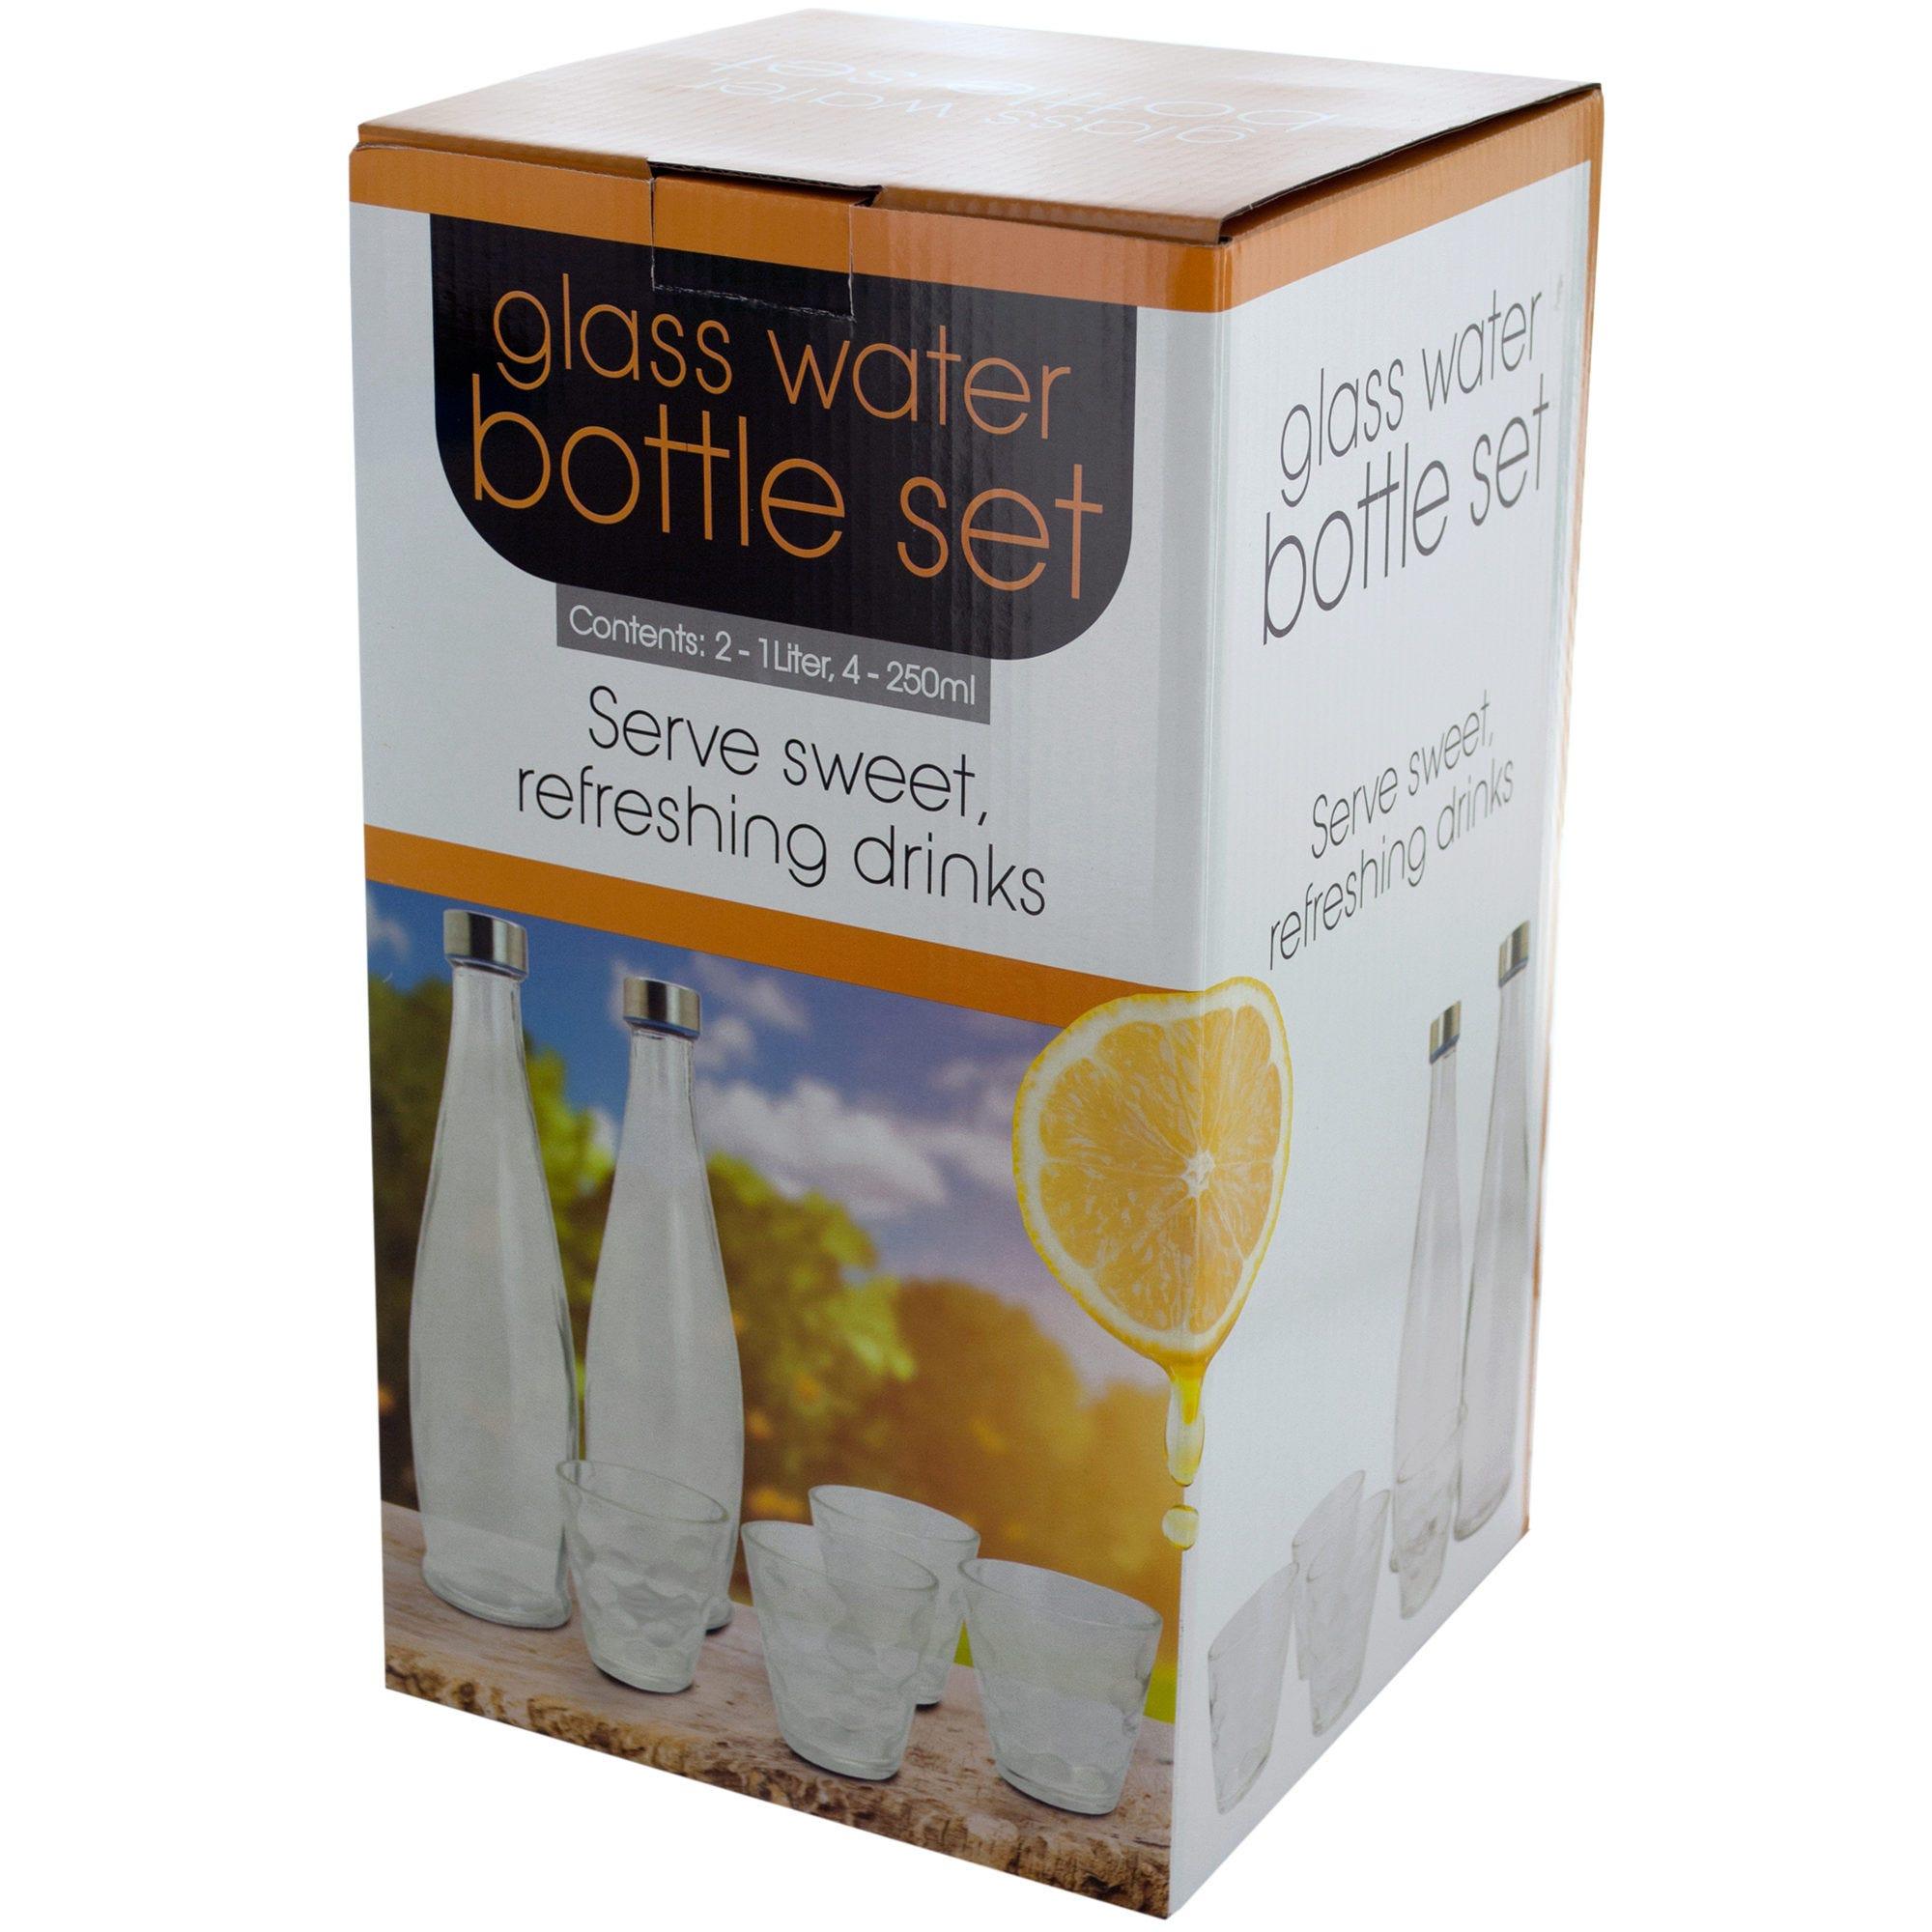 33.8 oz. Glass Water Bottles & 8.5 oz. GLASSES Set- Qty 4